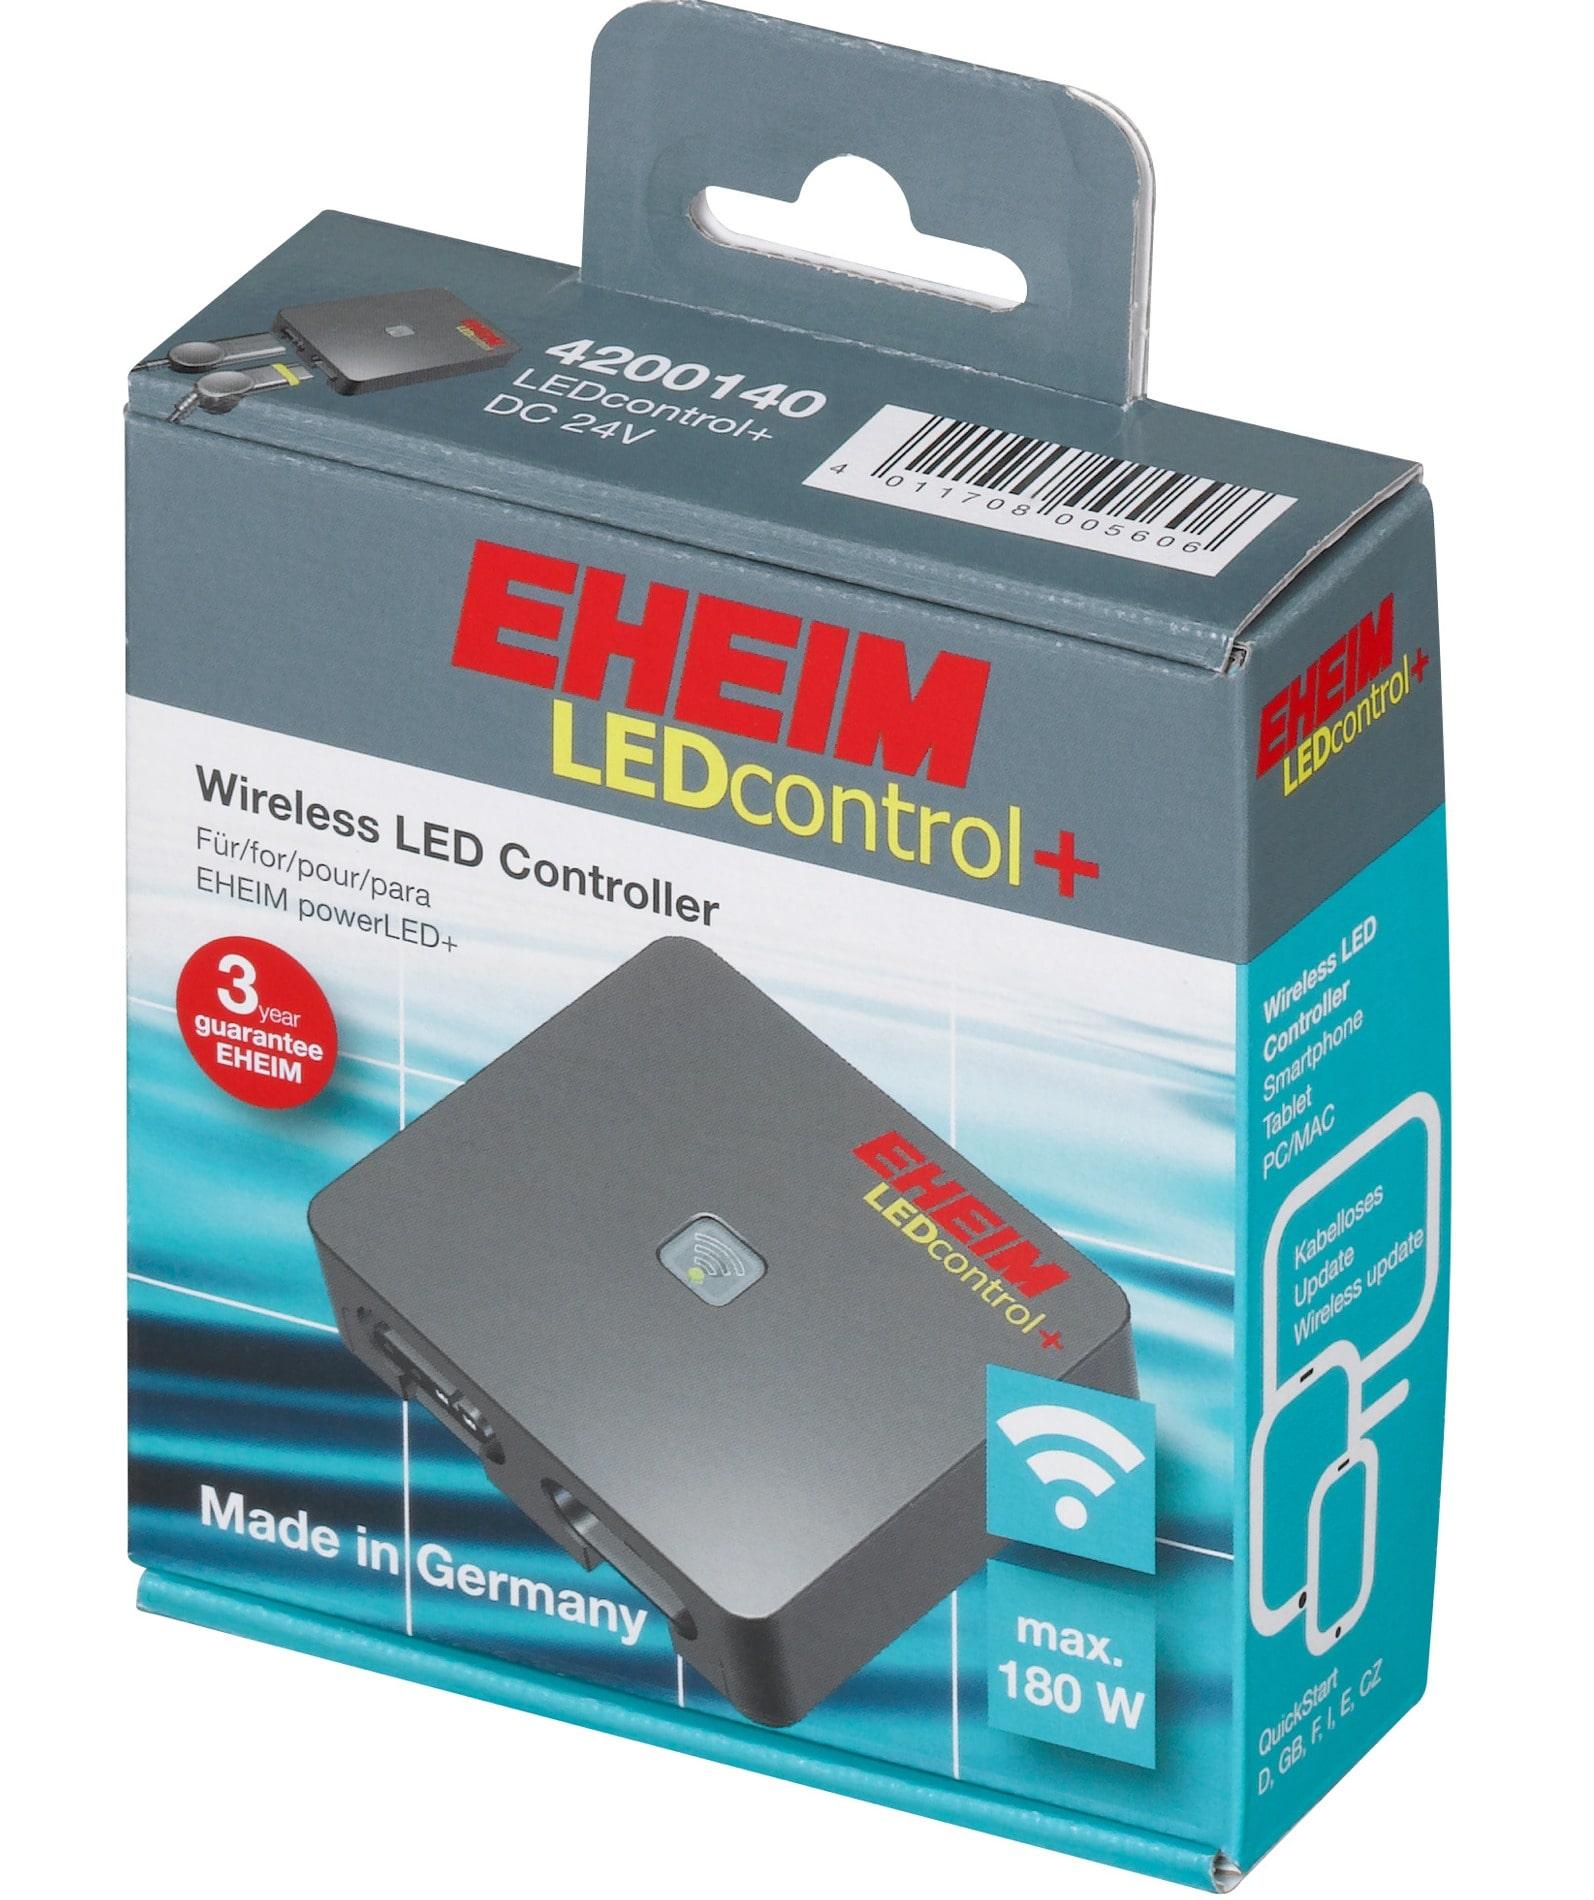 eheim-ledcontrol-plus-controleur-wireless-pour-rampe-powerled-min